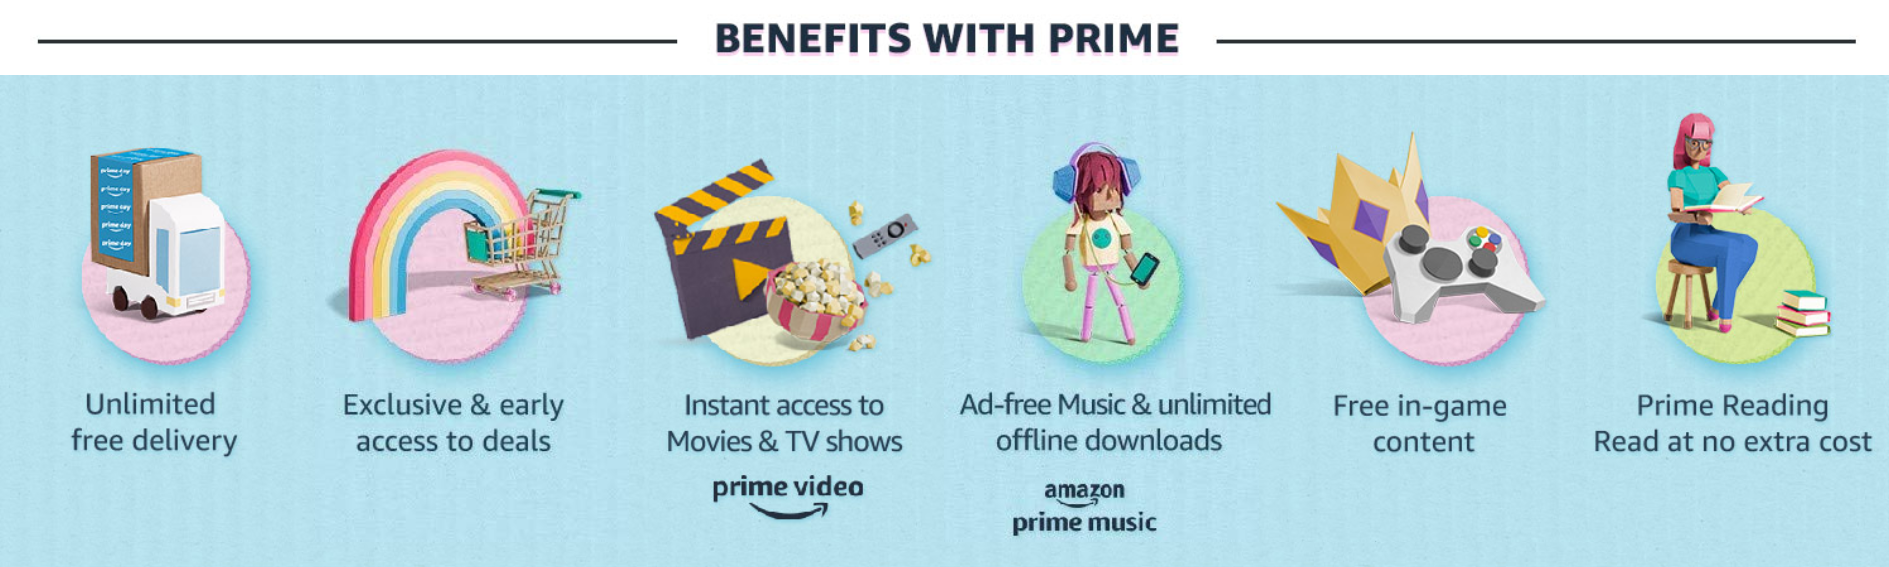 About Amazon prime